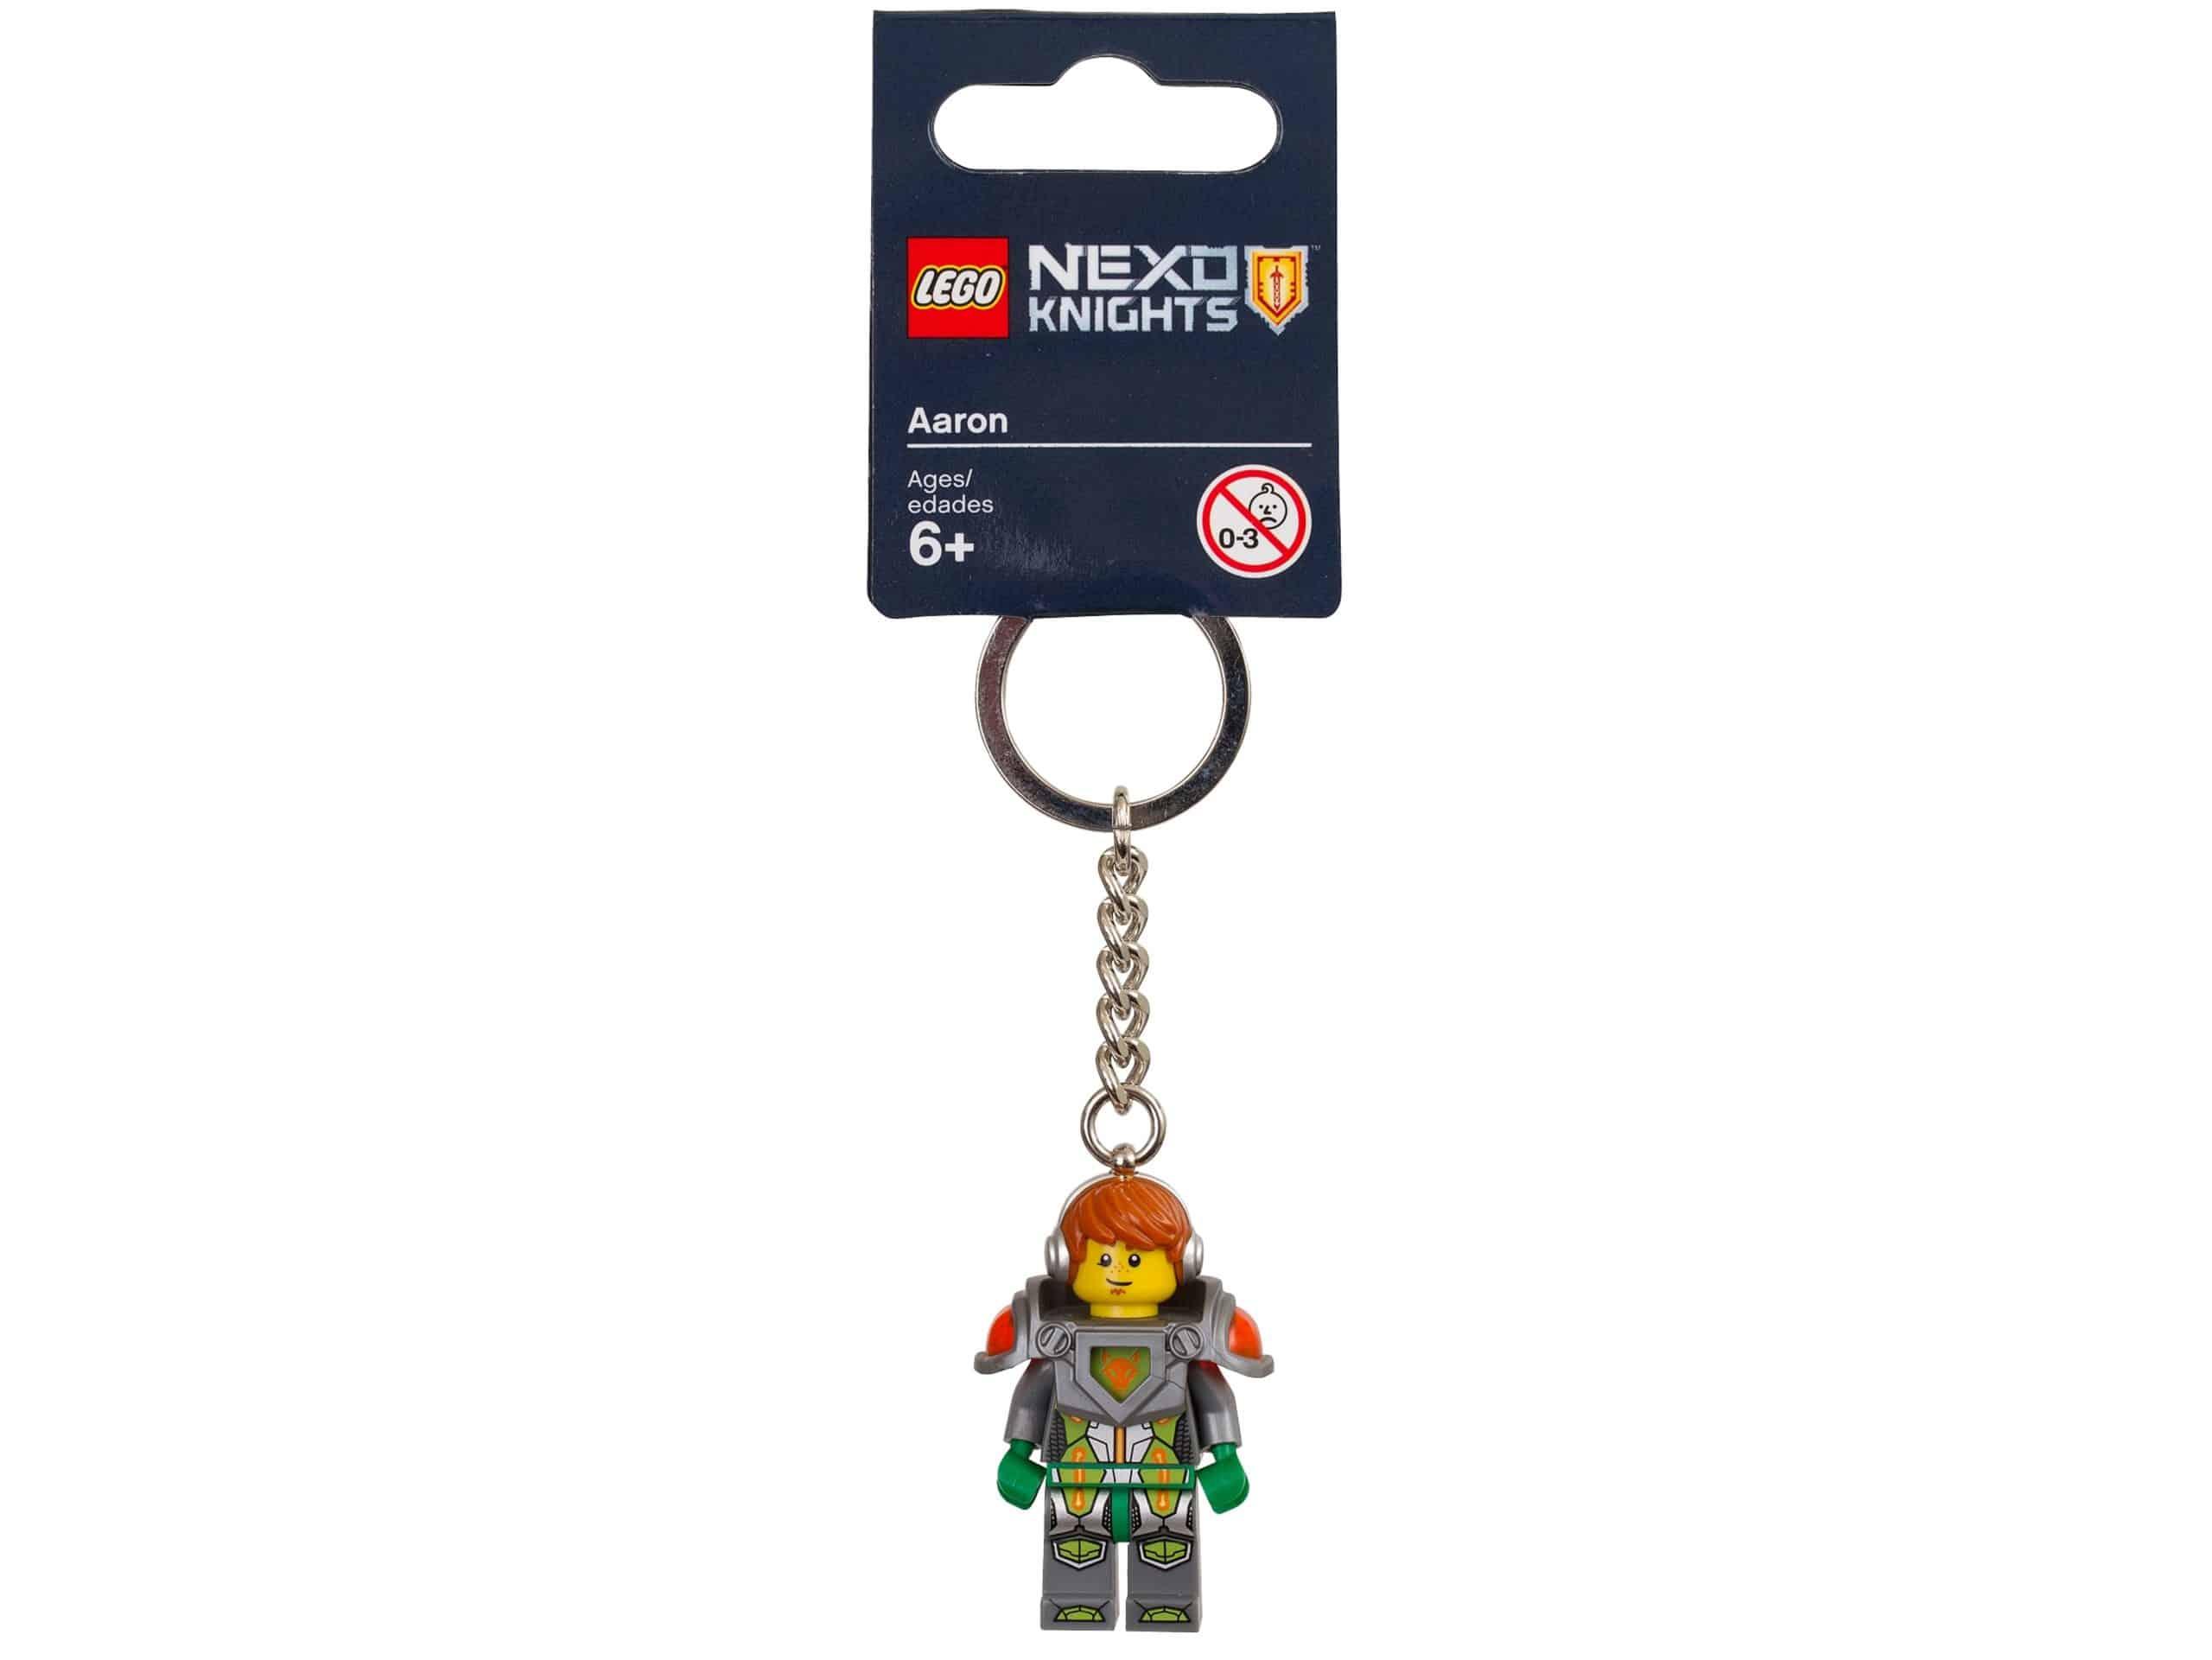 lego 853520 nexo knights aaron noglering scaled